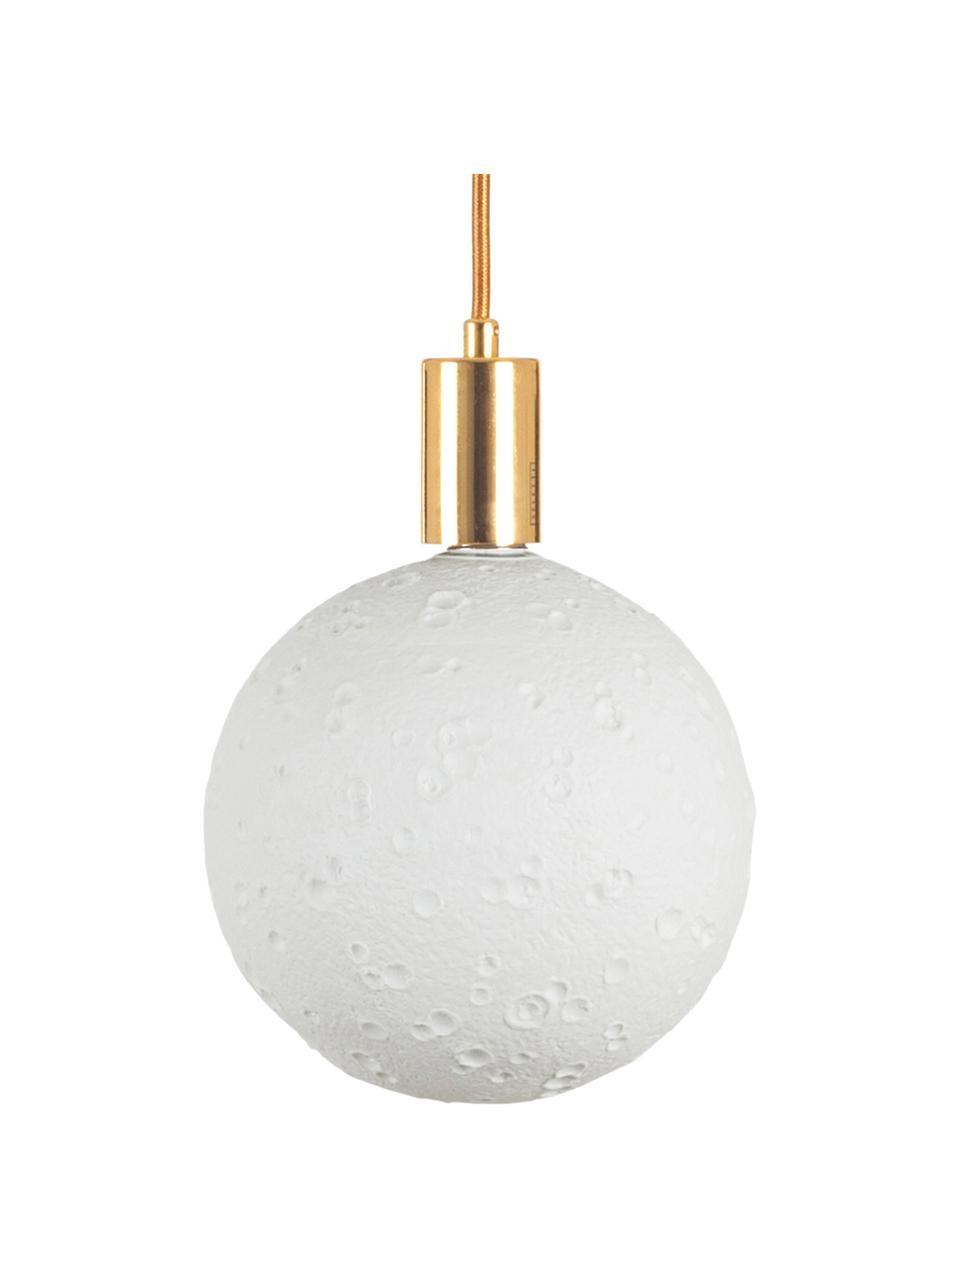 Lampada E27, 8W, bianco neutro, 1 pz, Paralume: porcellana, Base lampadina: alluminio, Bianco, Ø 18 x Alt. 20 cm